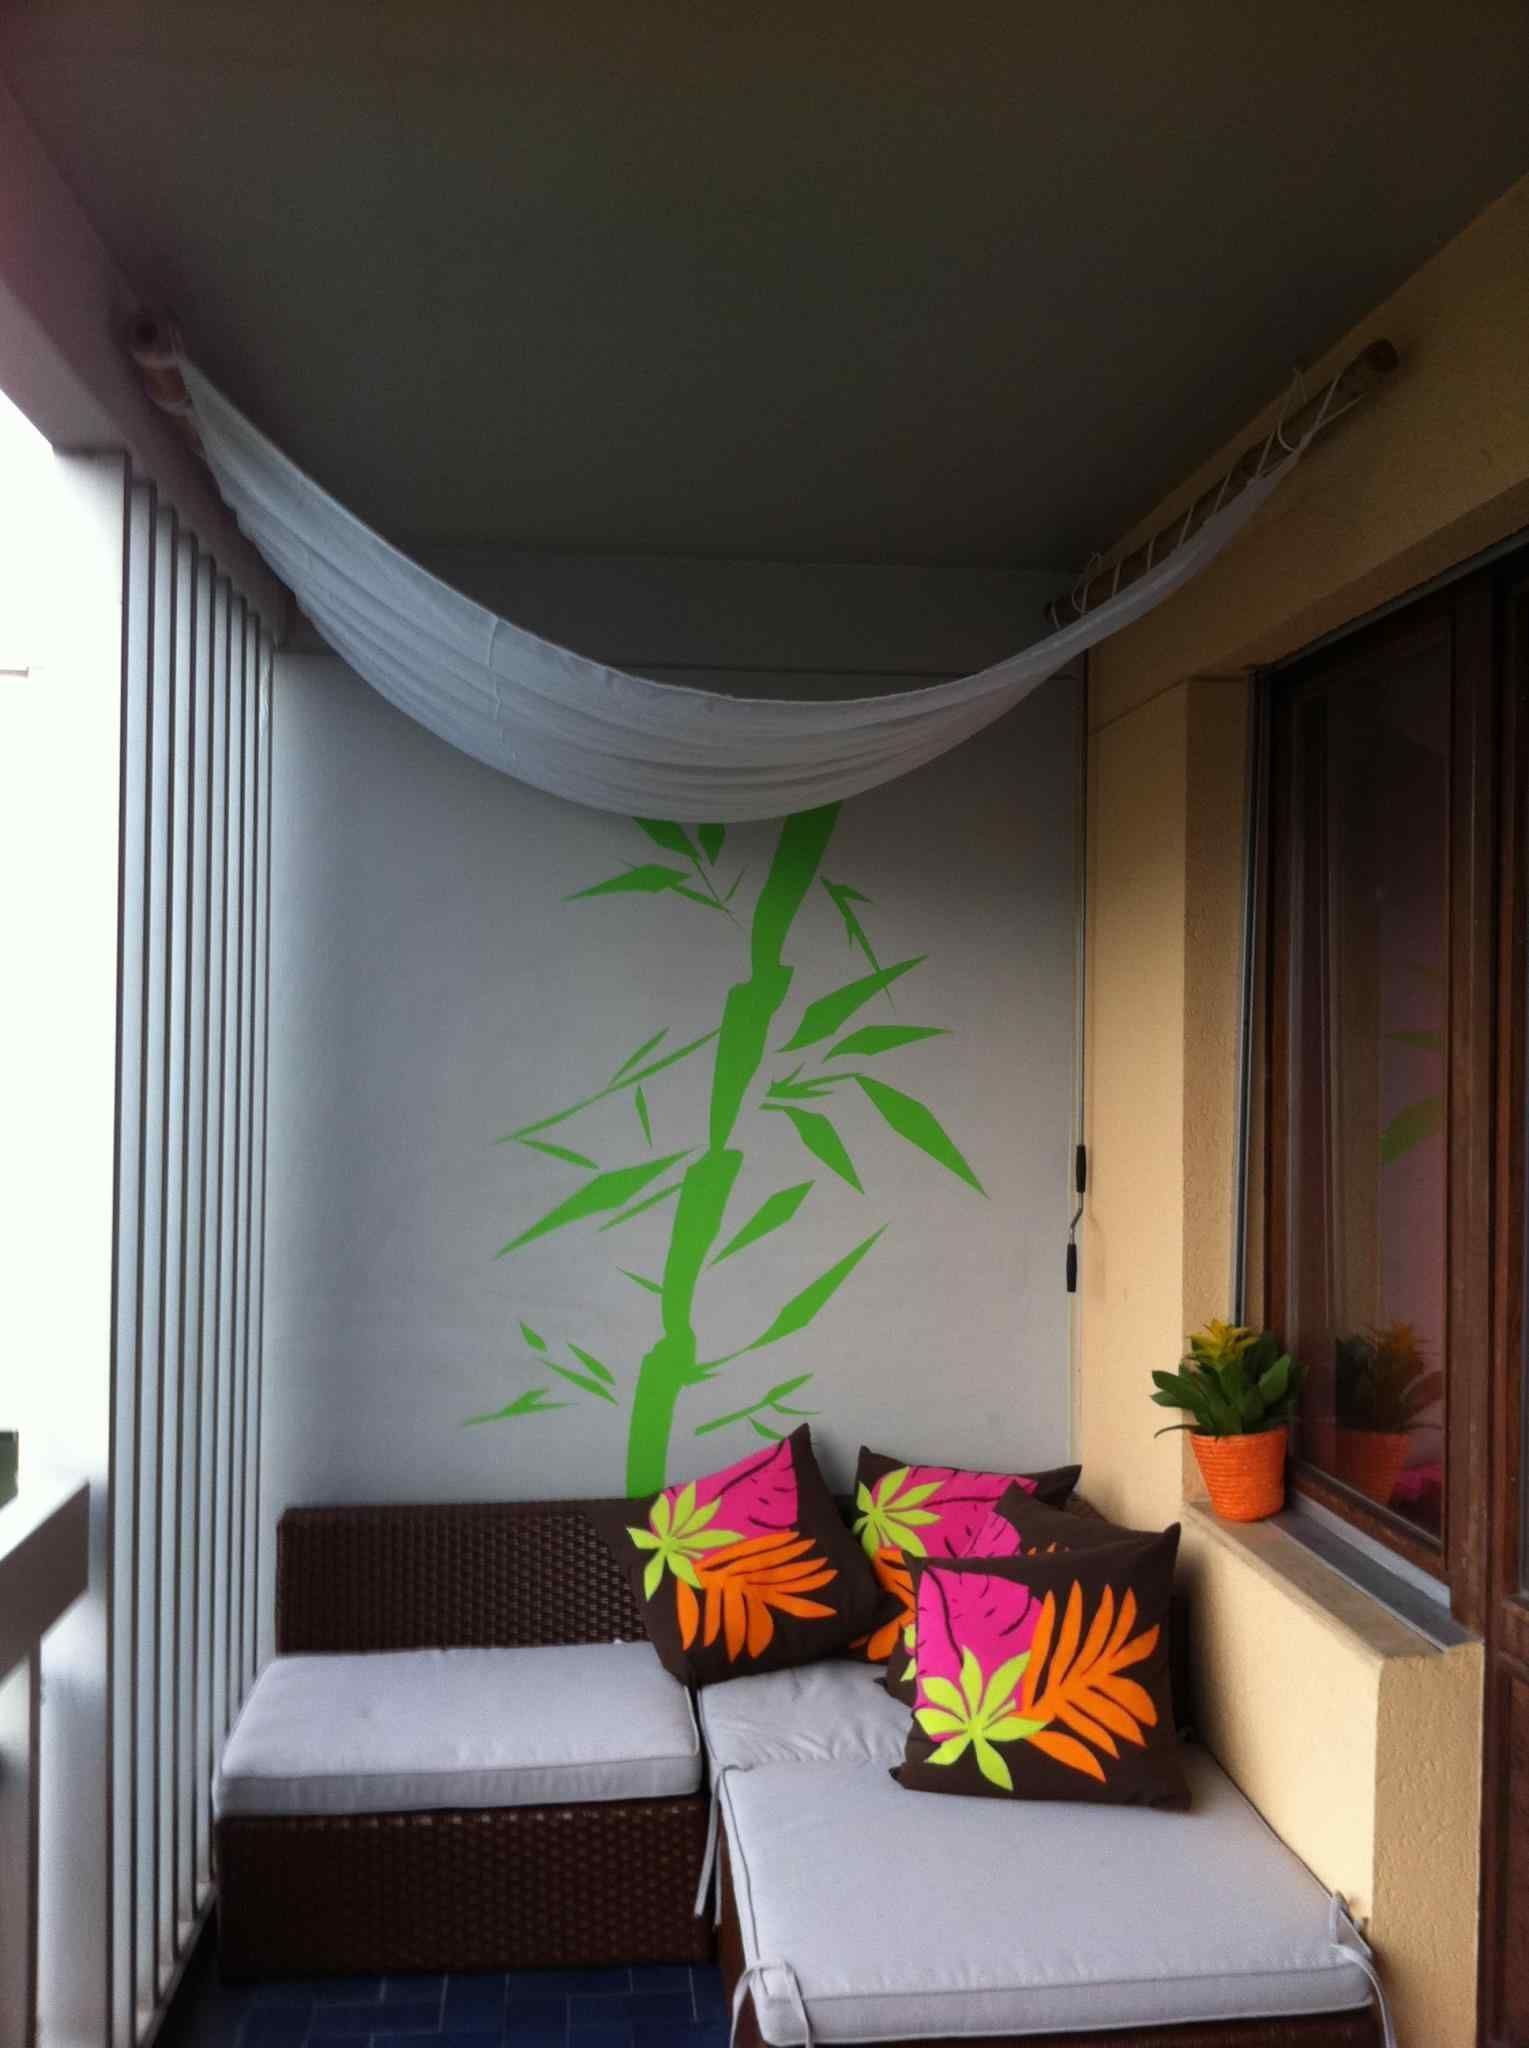 Adorable Apartment Balcony Canopy Ideas Breakpr Balcony Shade Apartment Balconies Balcony Decor